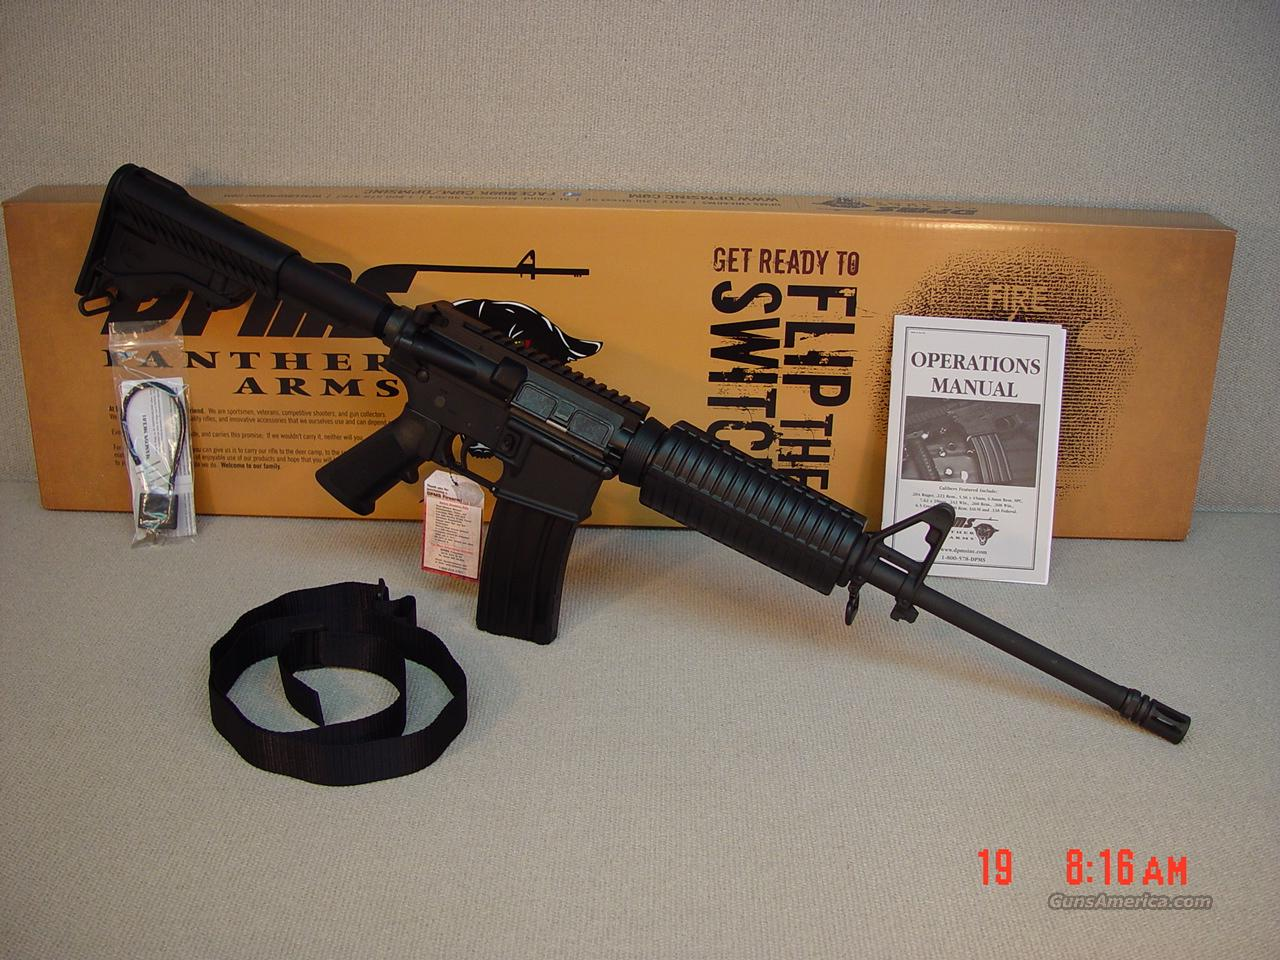 DPMS Lite16 A3 223 Rem / 5.56mm NATO   Guns > Rifles > DPMS - Panther Arms > Complete Rifle